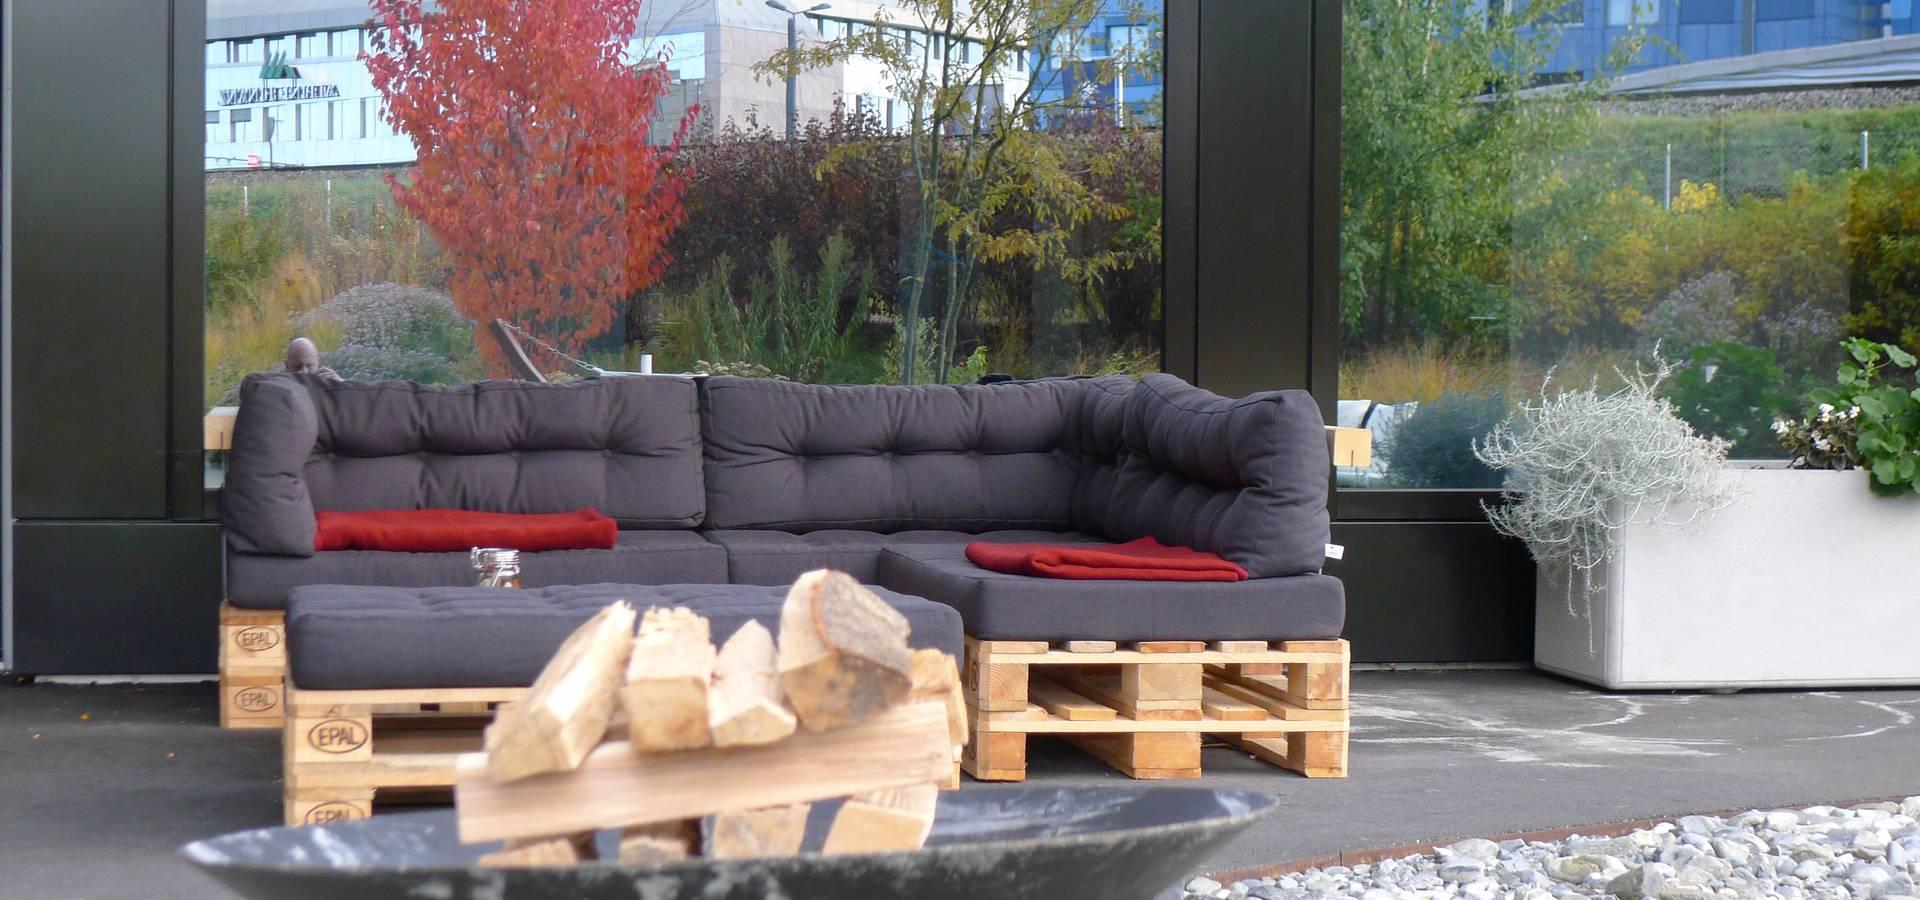 Loungebereich by Florian Kirchner - Palettenliebe.de | homify